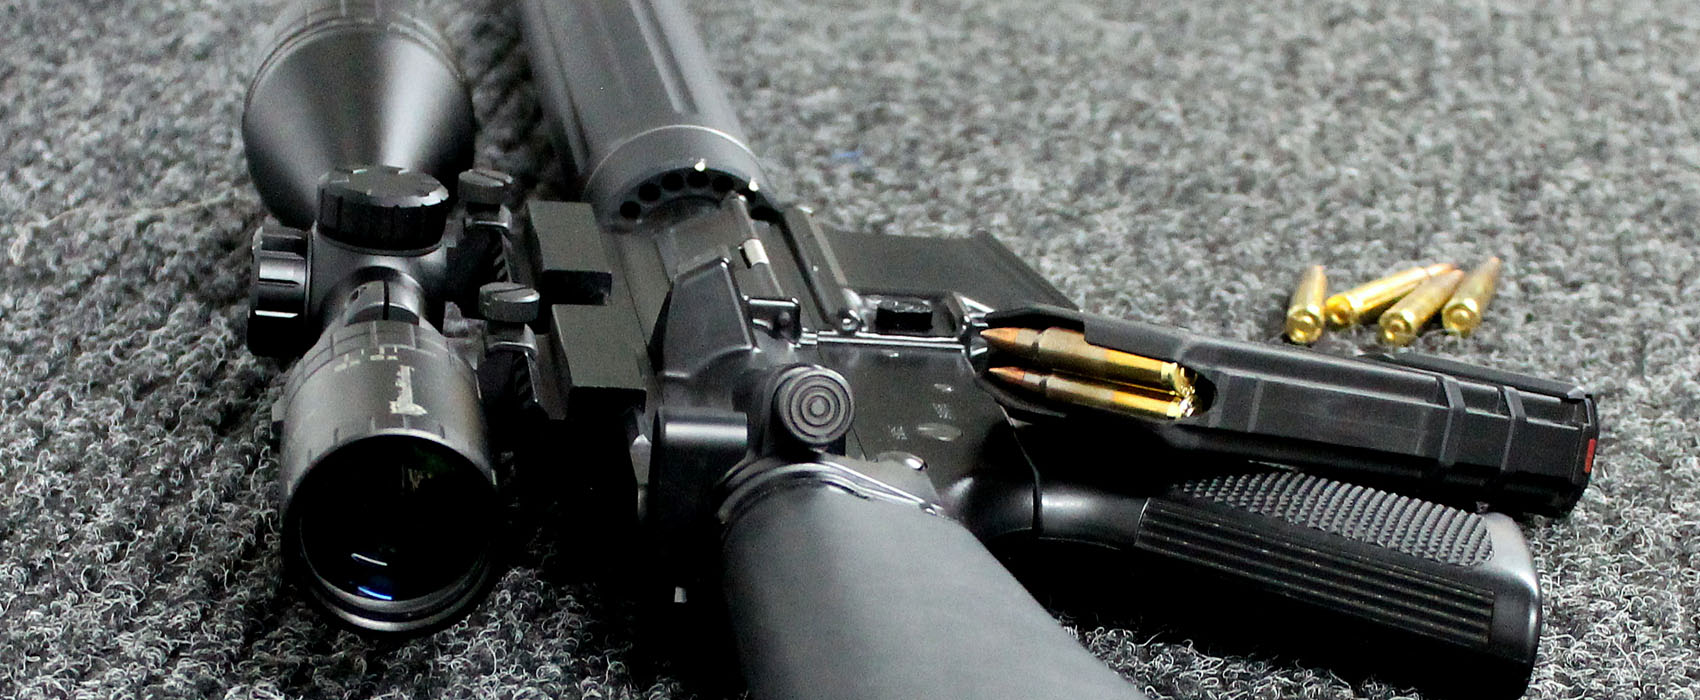 AR 15 im Kaliber .223 Rem